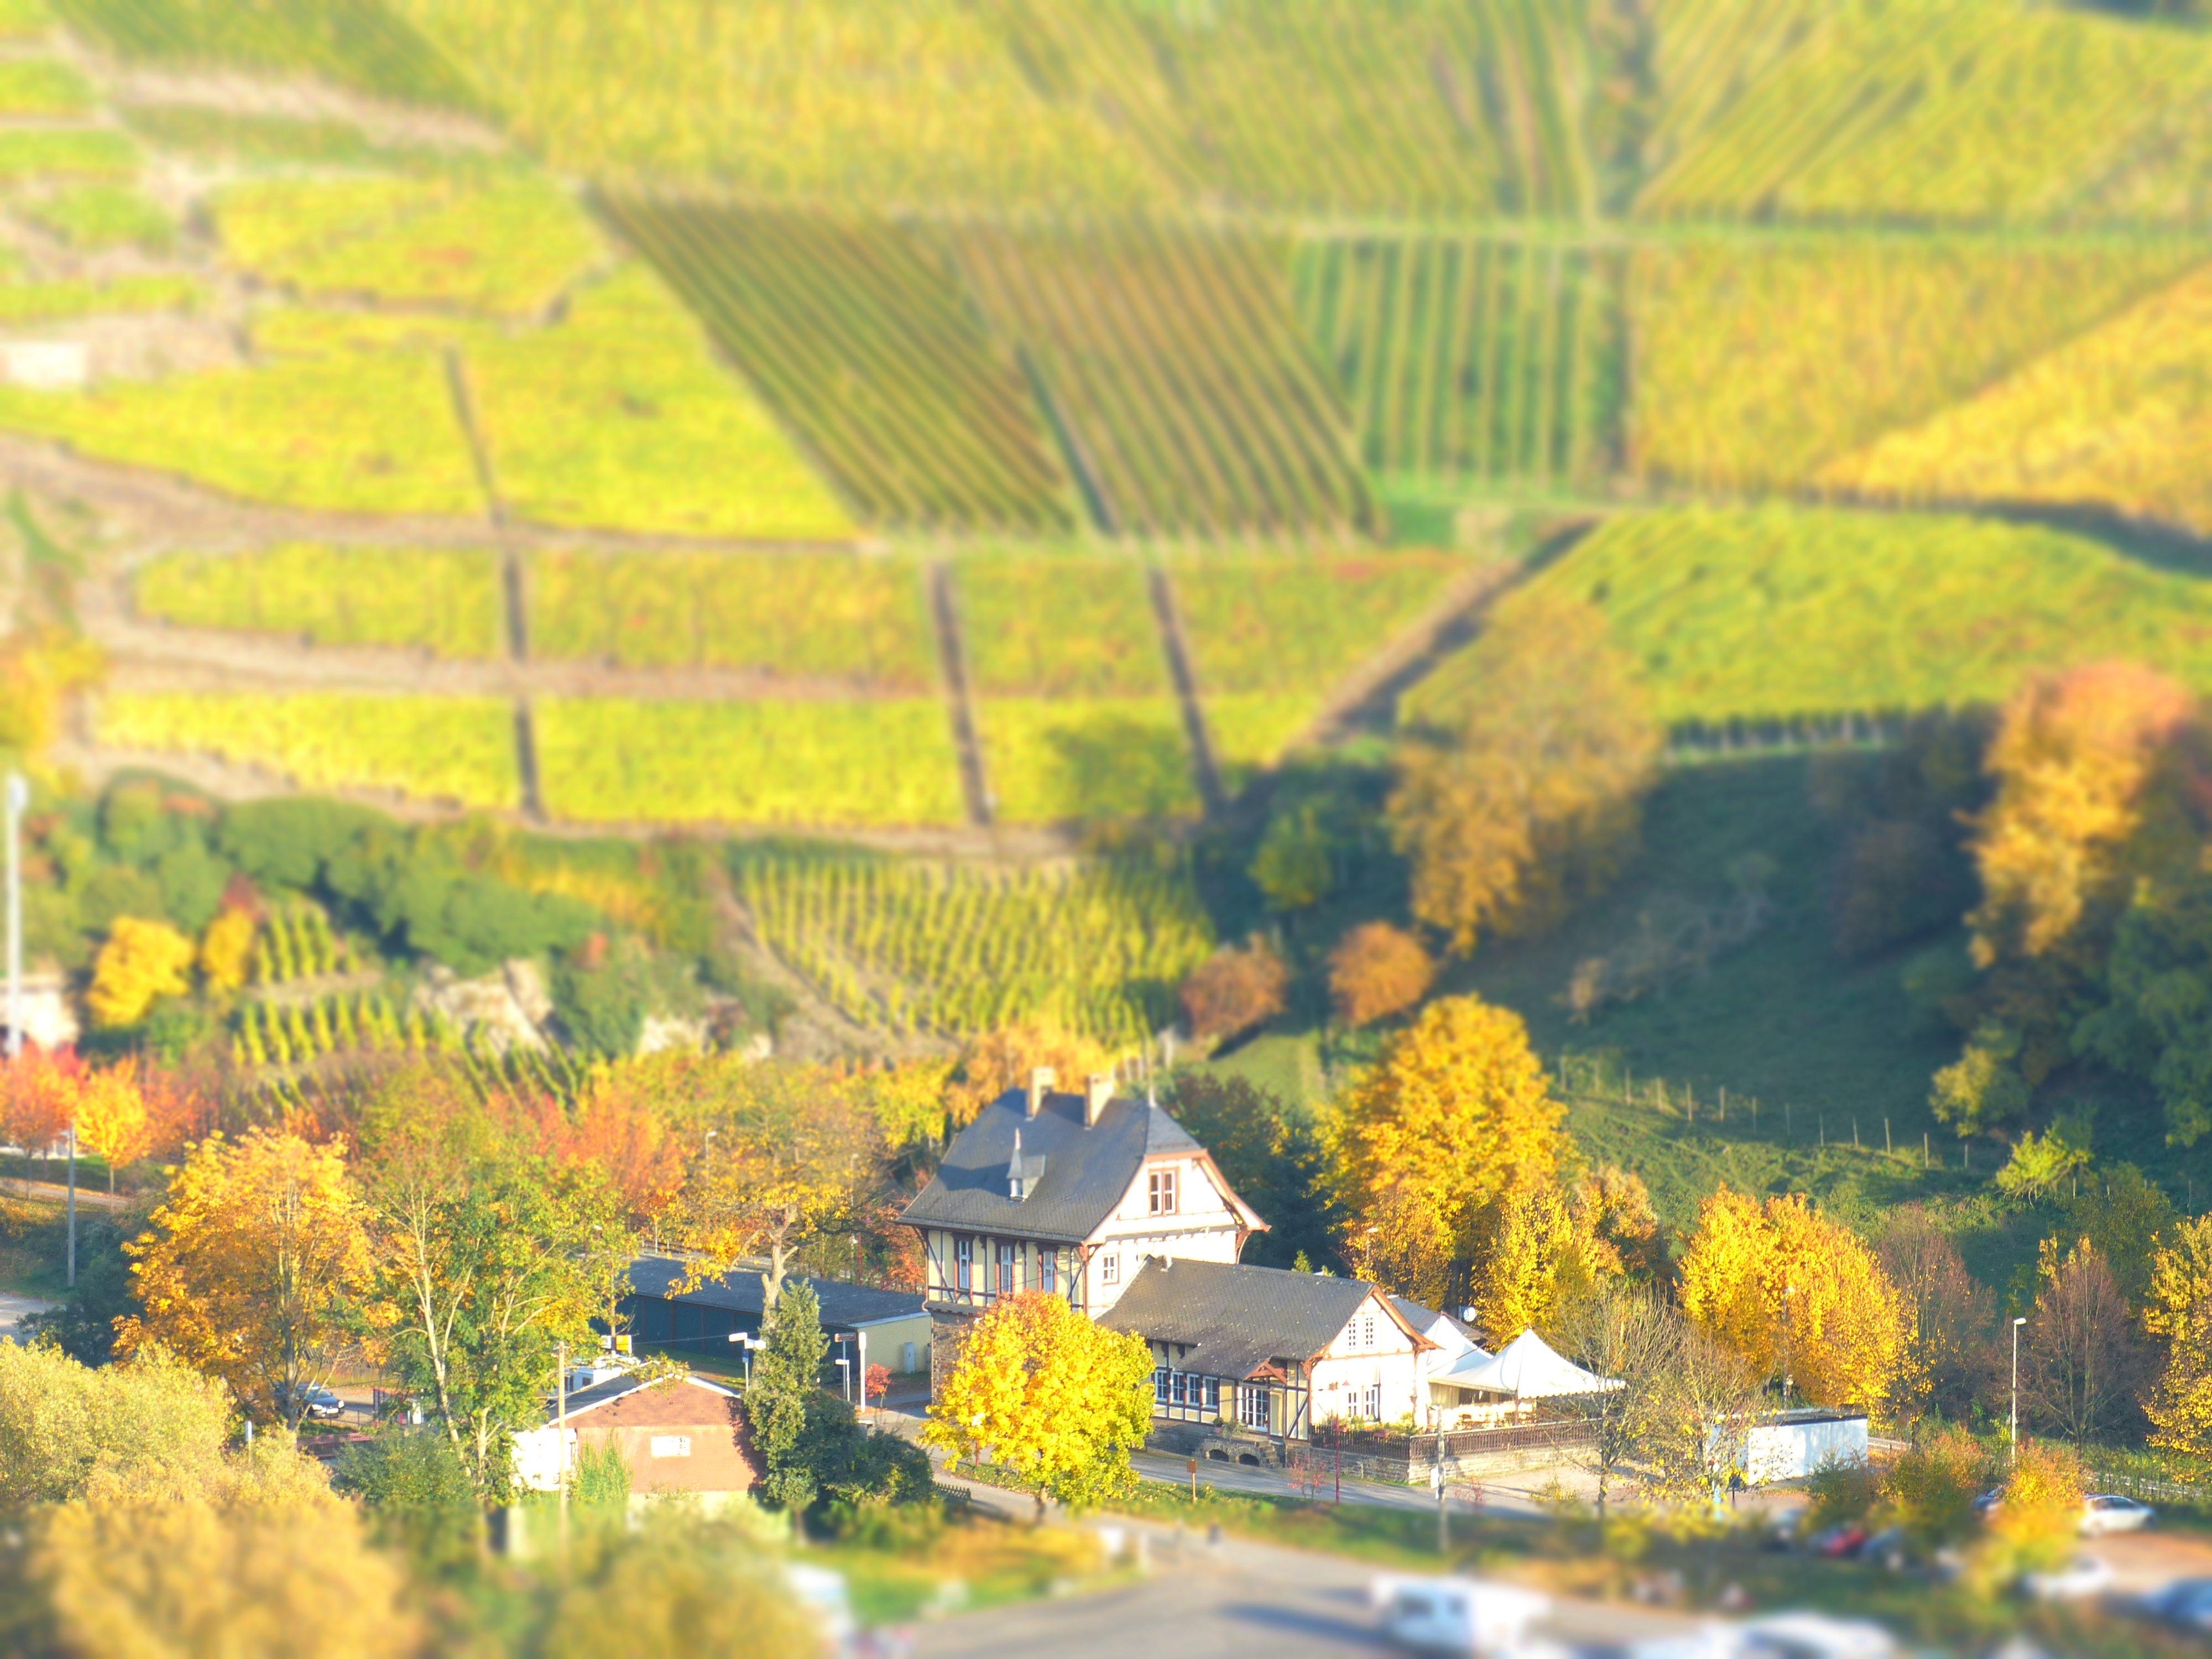 Top 3 International food in Mayschoss, Rhineland-Palatinate, Germany